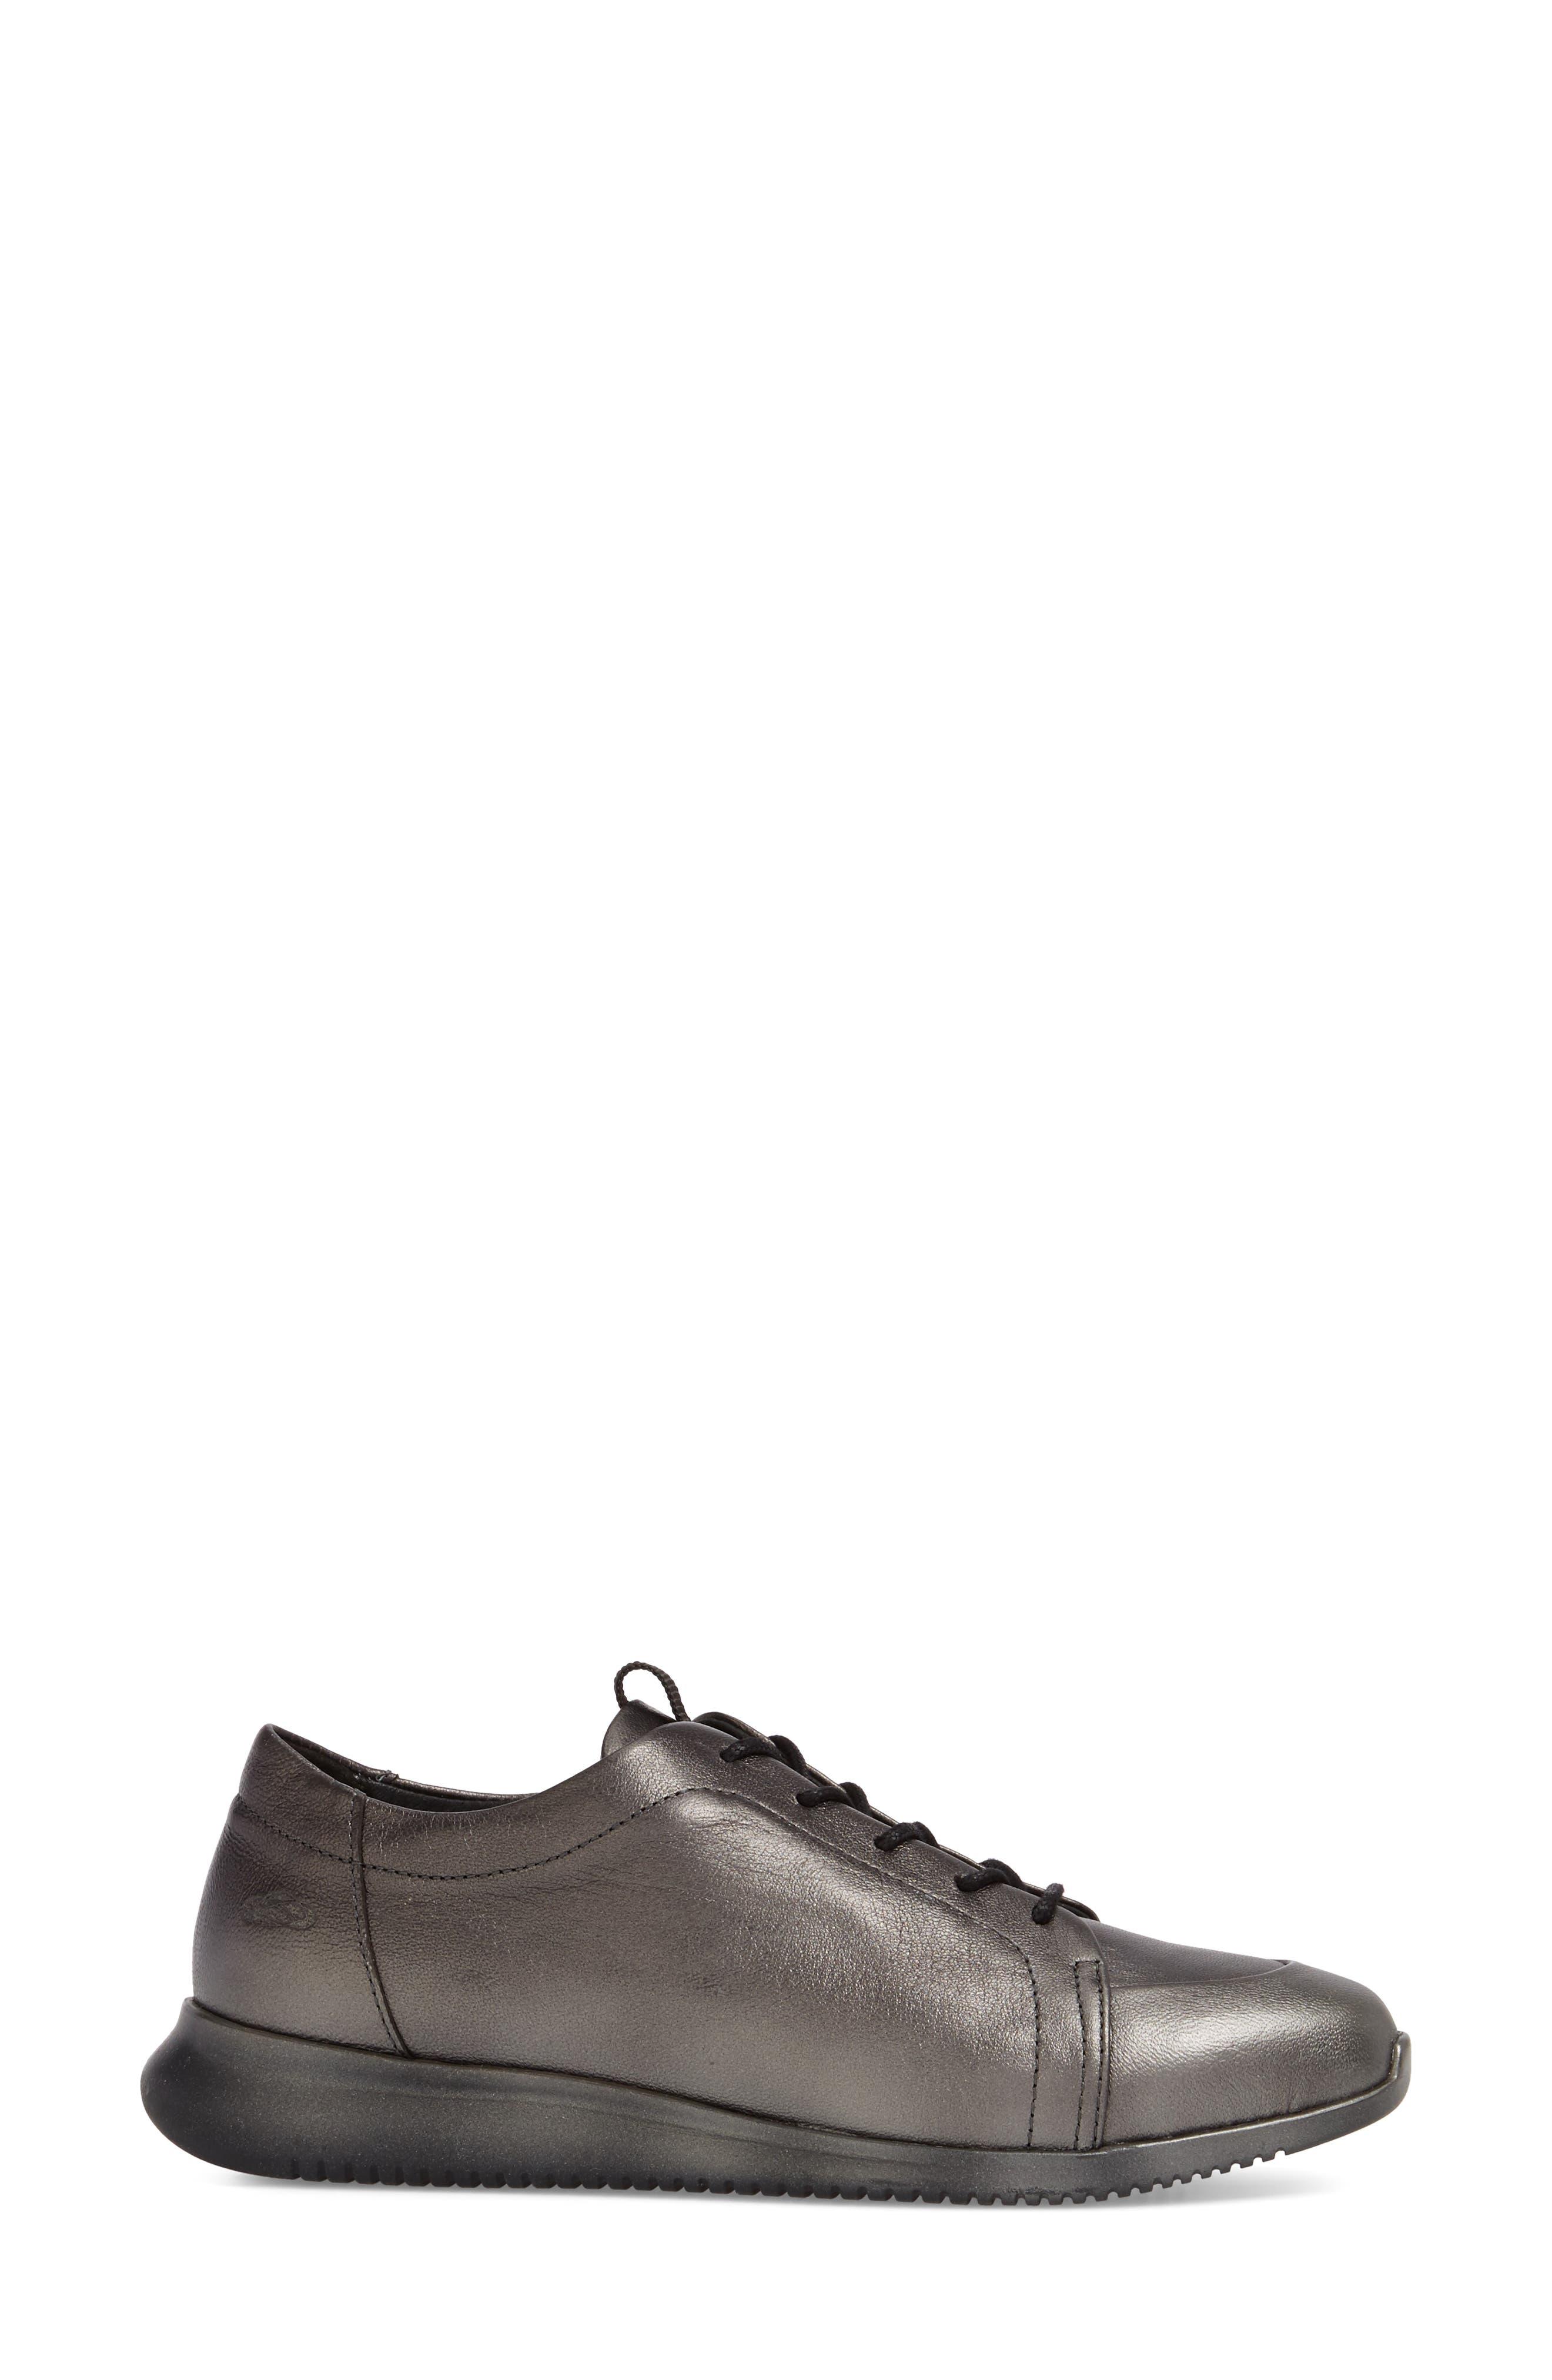 Ria Sneaker,                             Alternate thumbnail 3, color,                             Pirita Leather